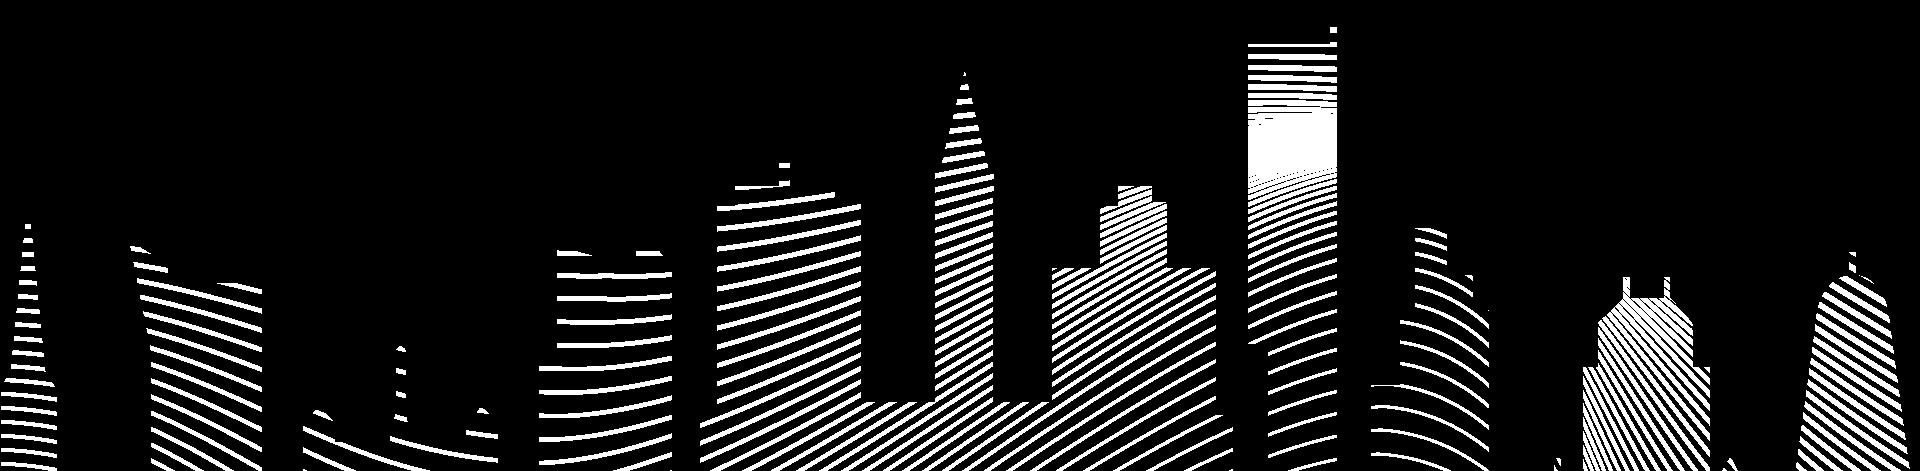 inboxx-email-marketing-home-hero-skyline